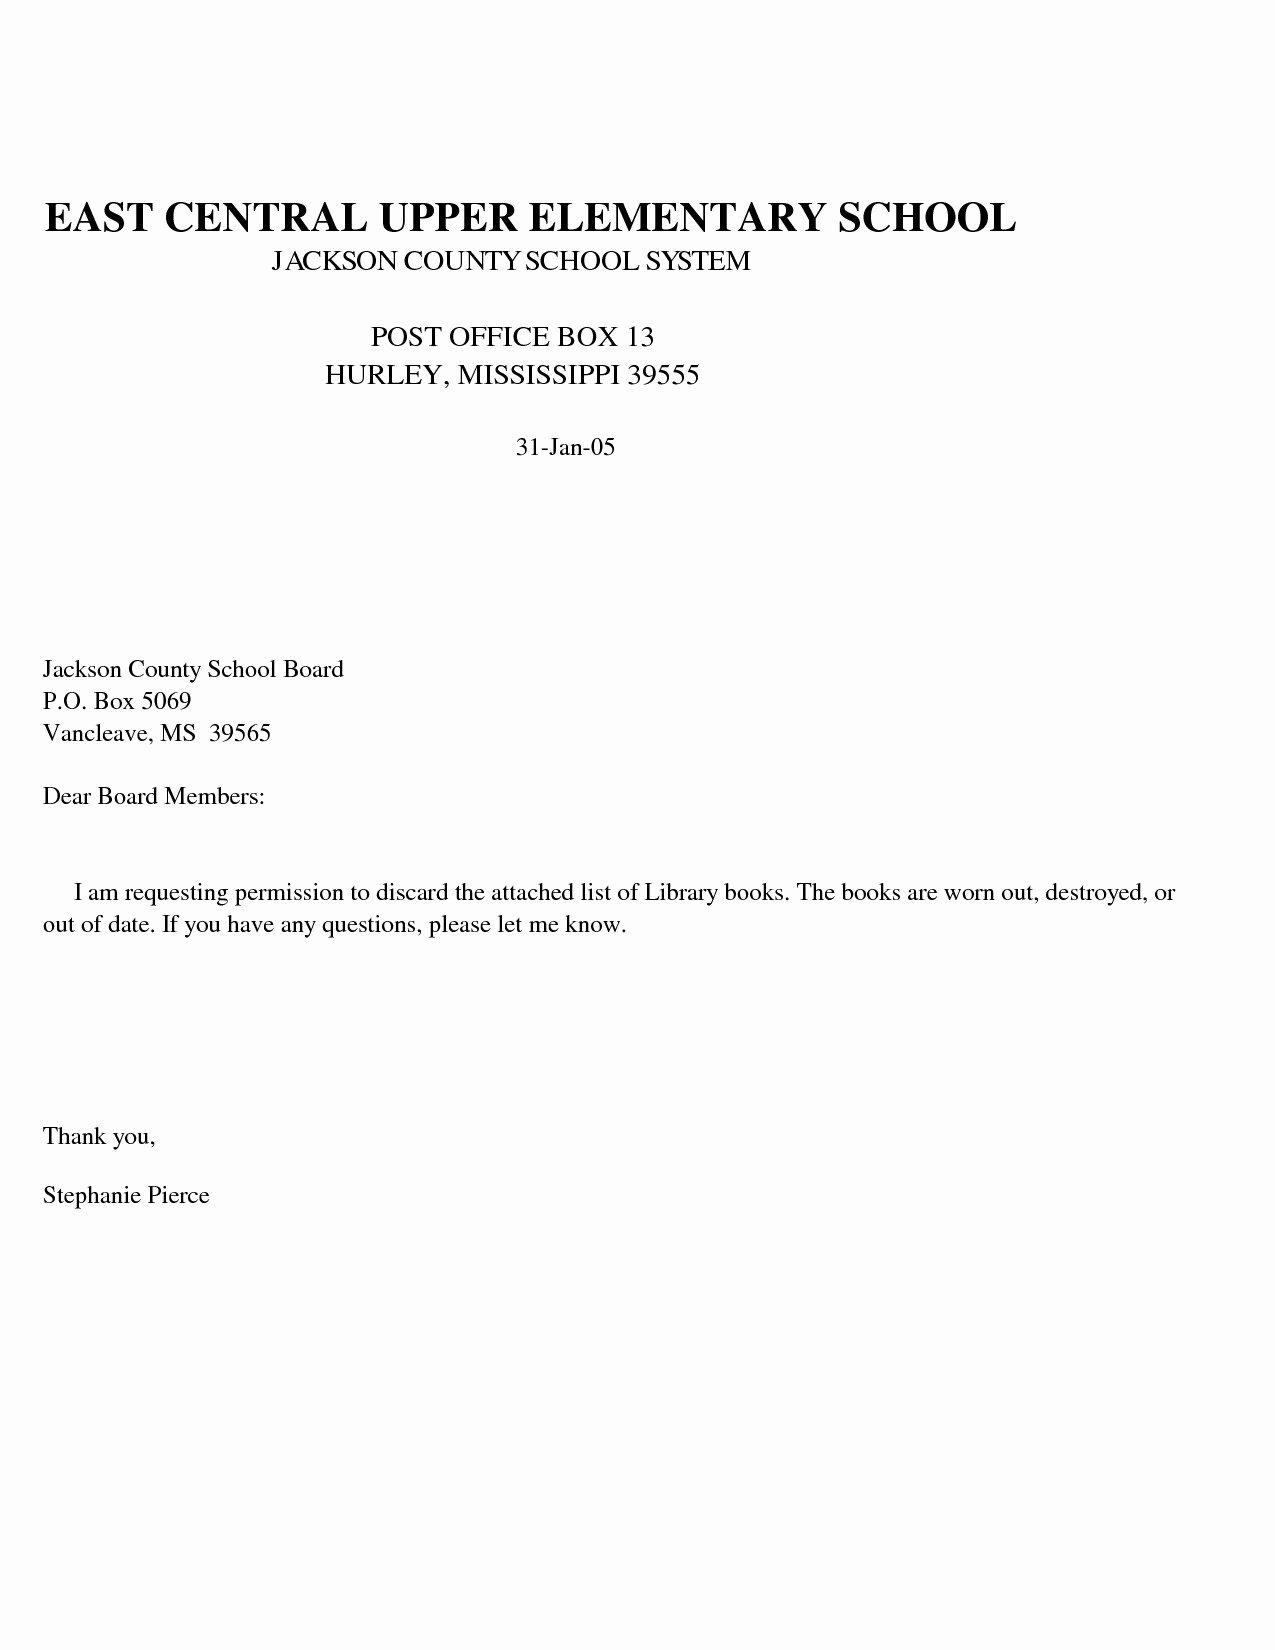 15 job application letter in short